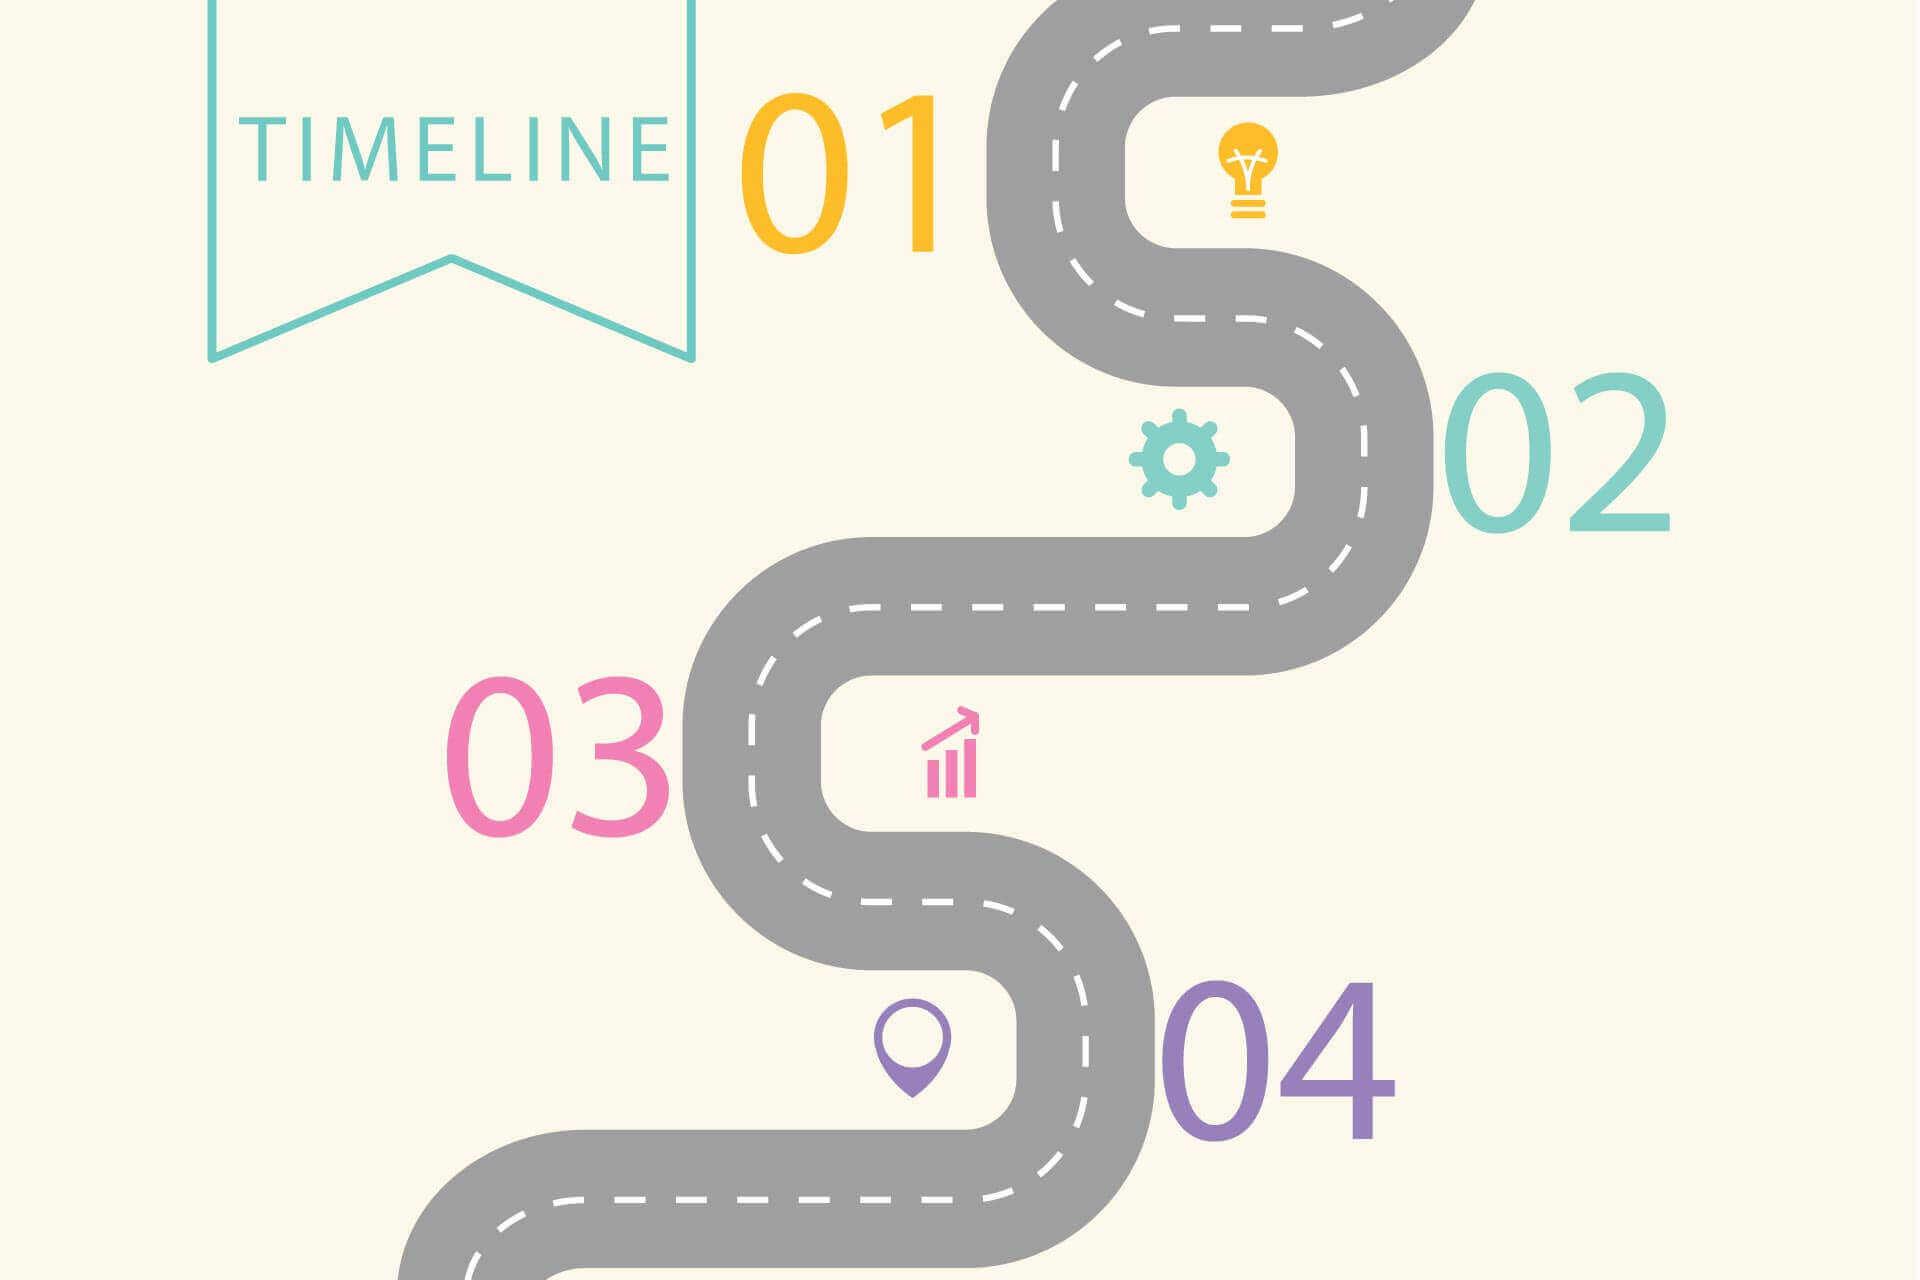 چگونه در طراحی پاورپوینت تایم لاین بسازیم؟